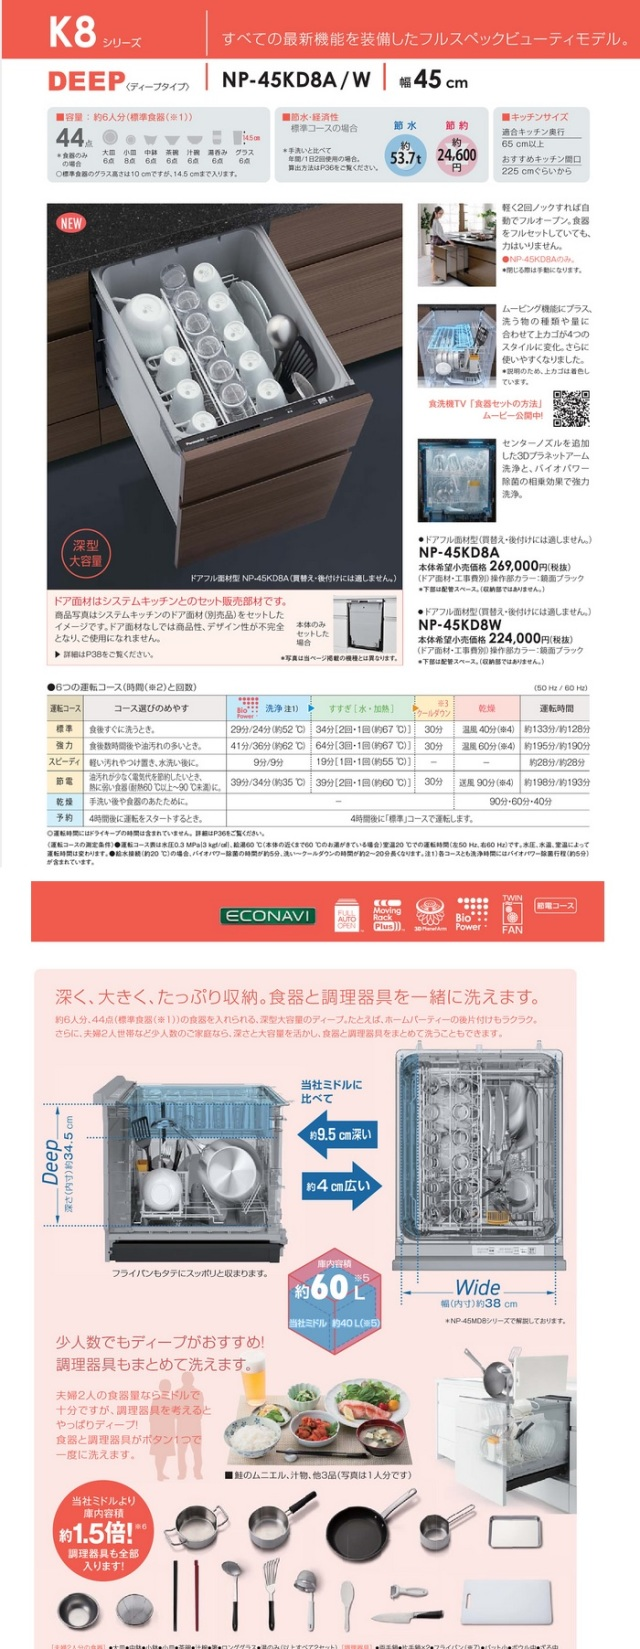 Panasonic ビルトイン食器洗い乾燥機 KD8A 商品説明